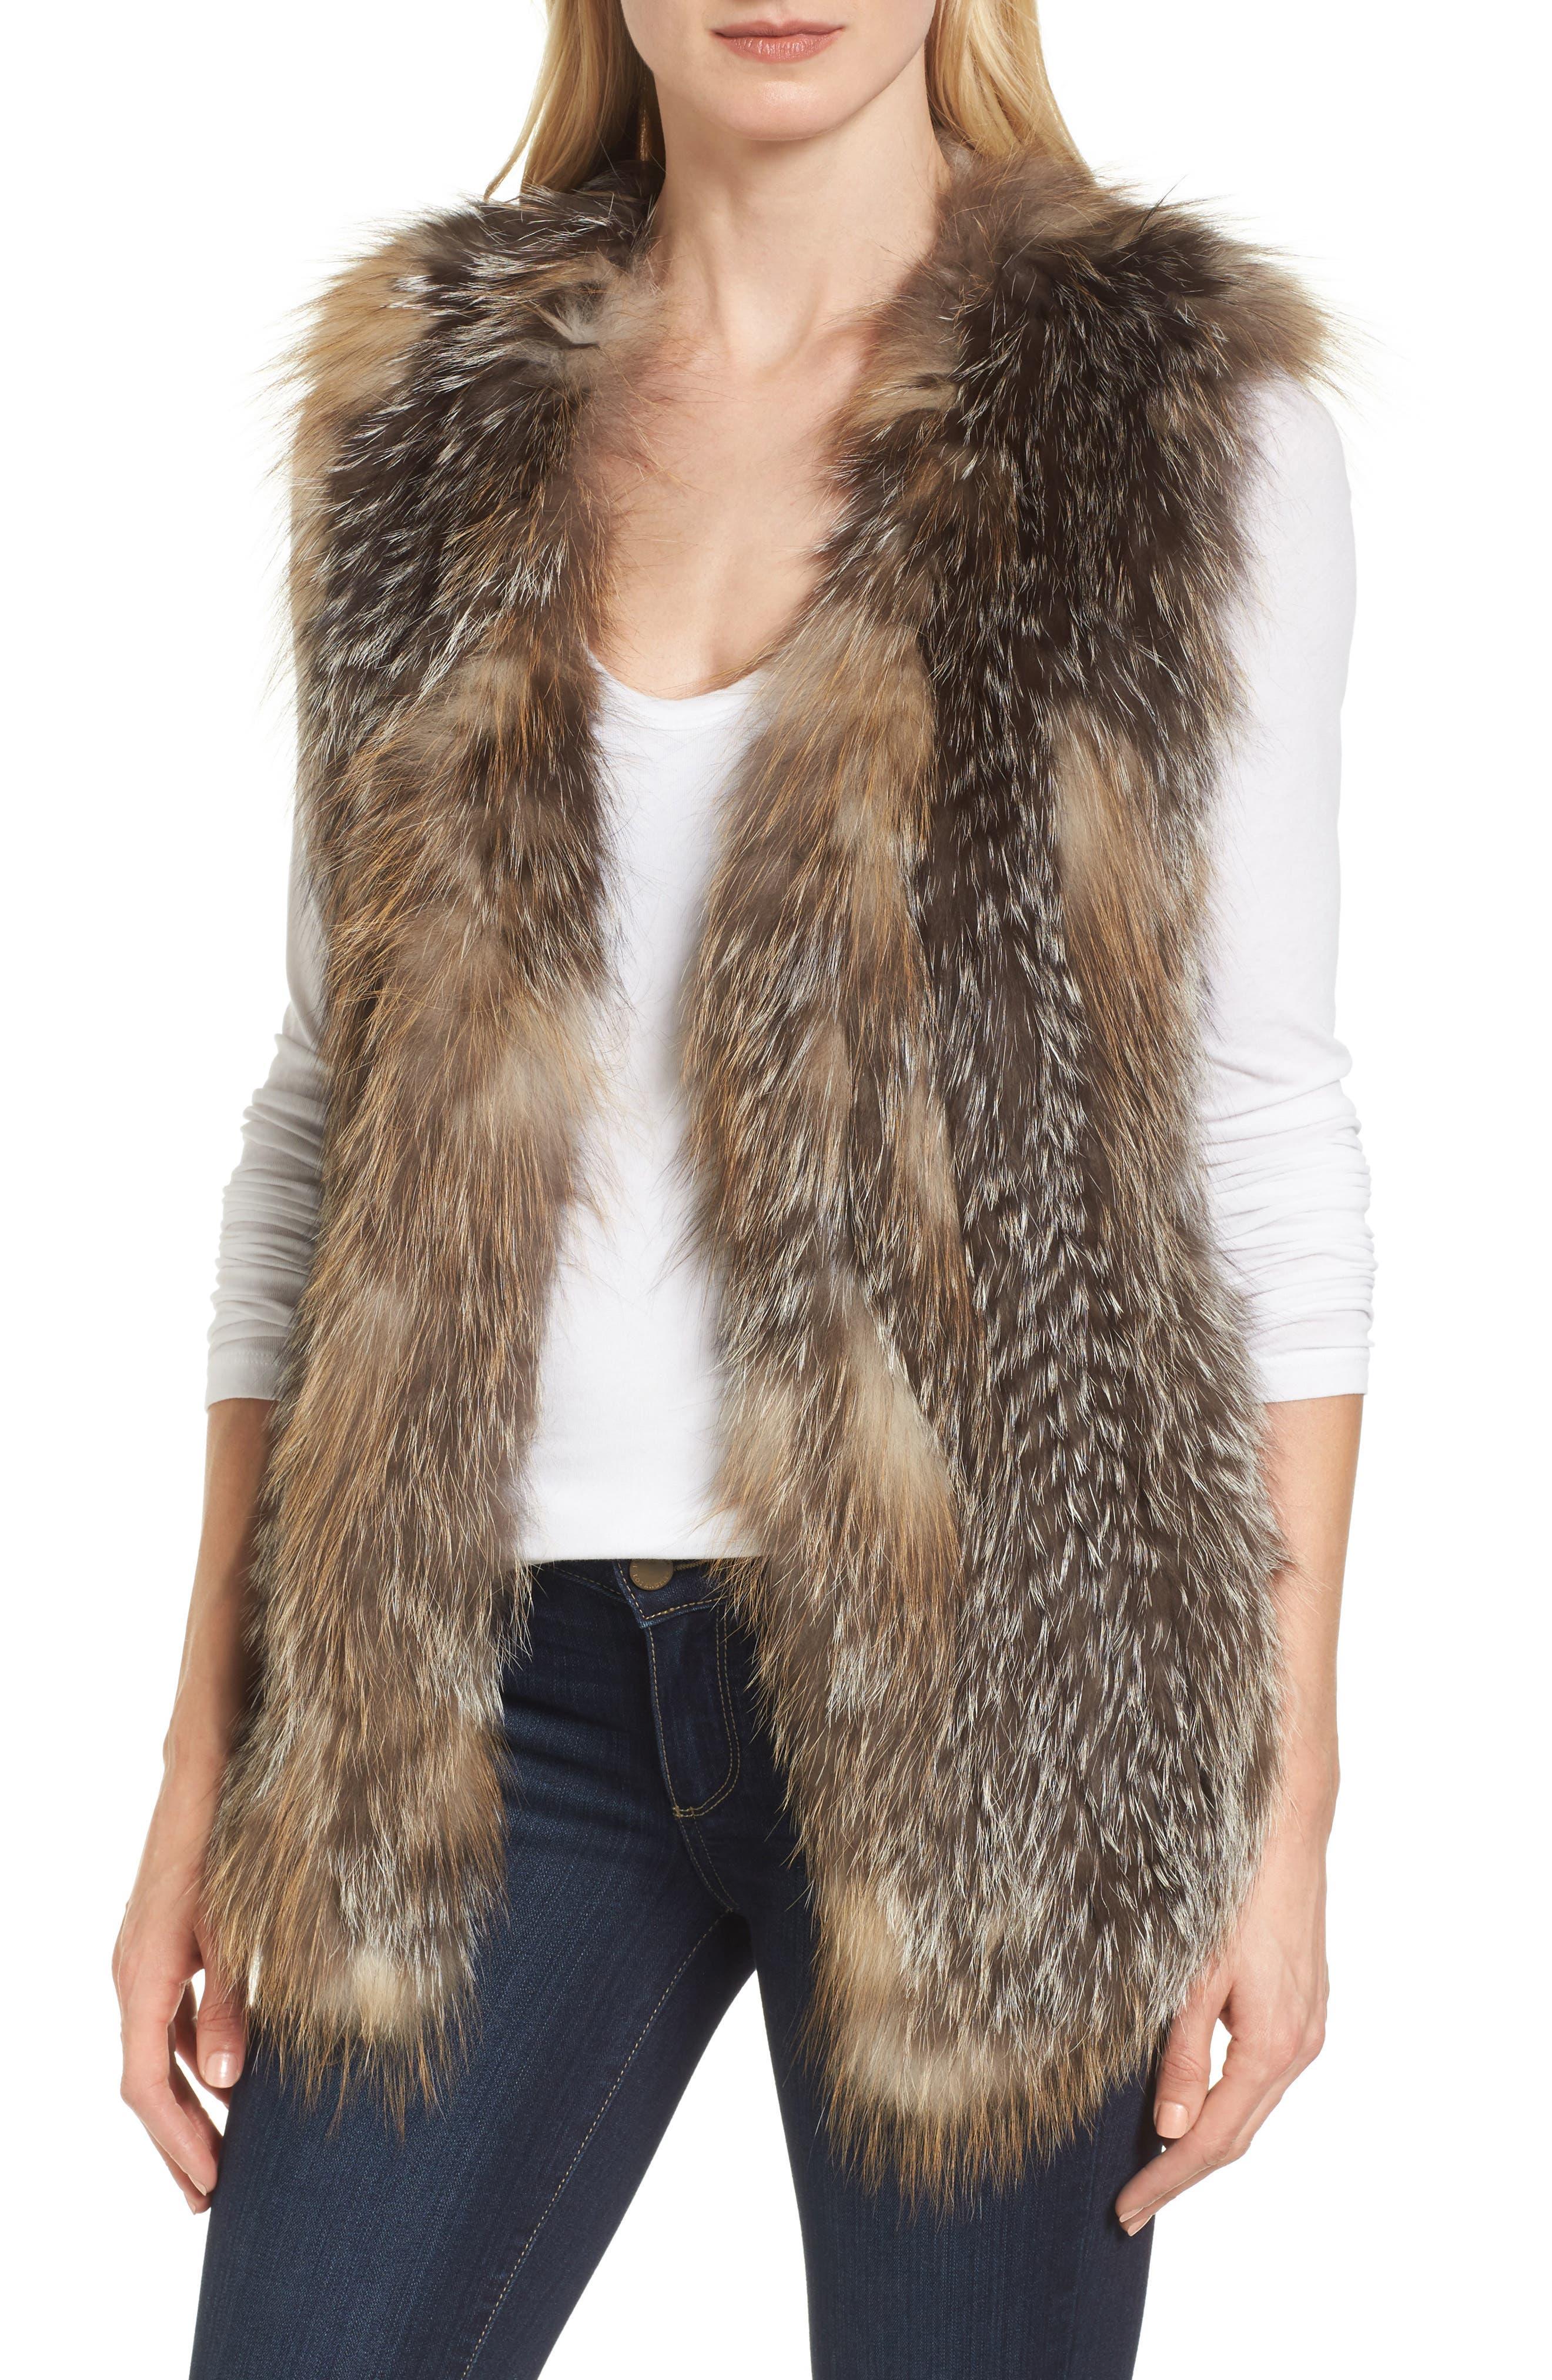 Genuine Fox Fur Vest,                             Main thumbnail 1, color,                             Natural Gold